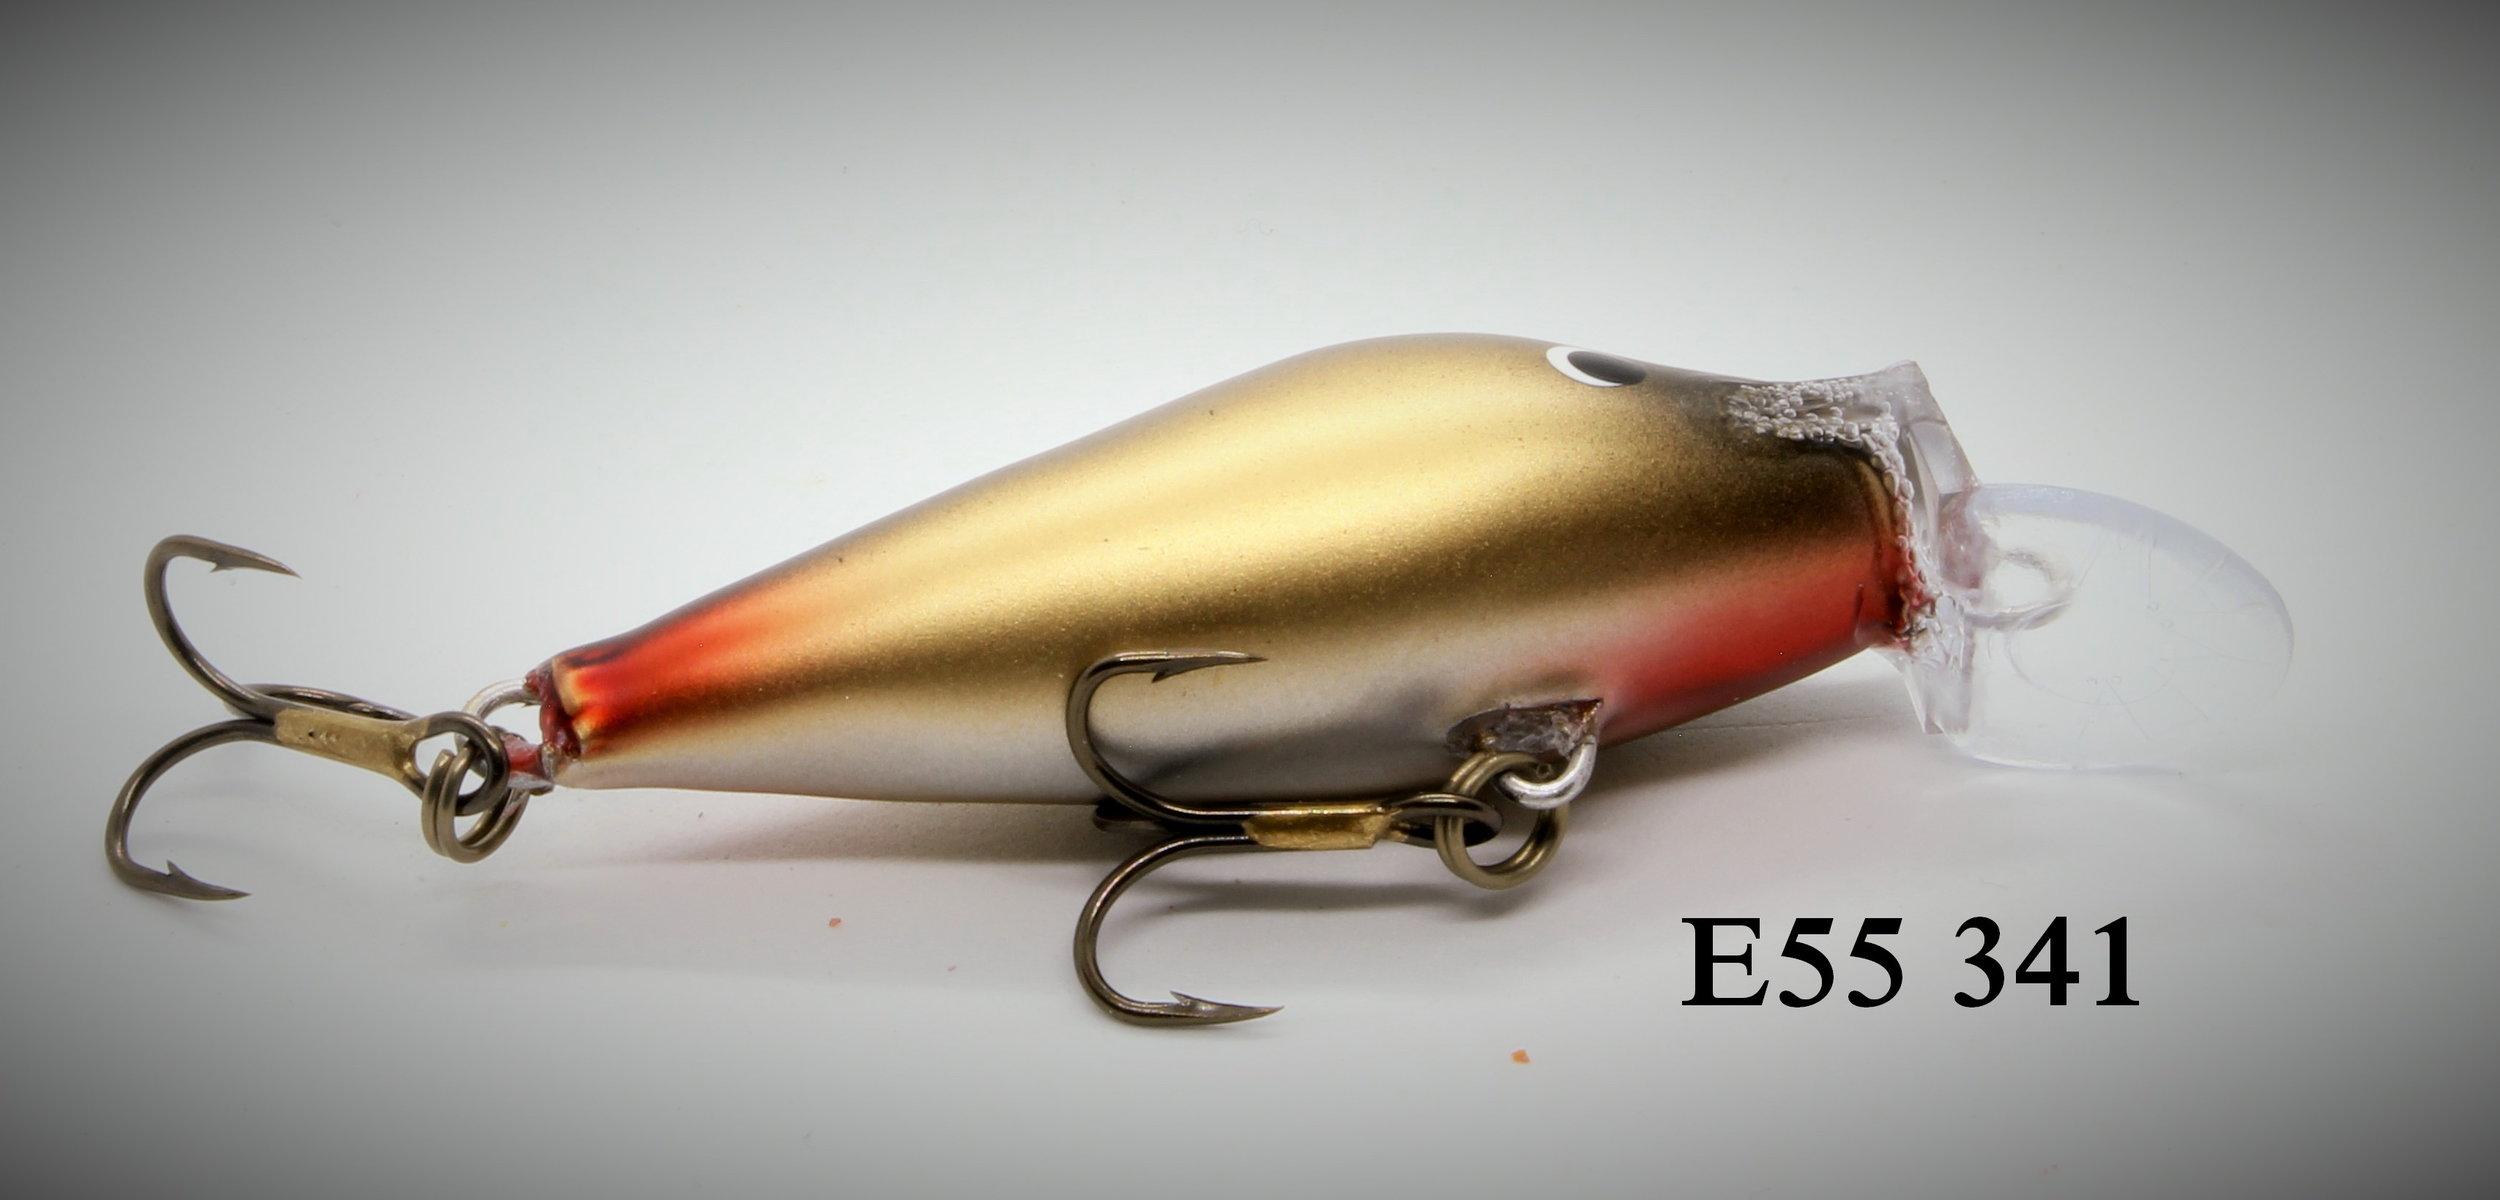 AE55341_1.jpg